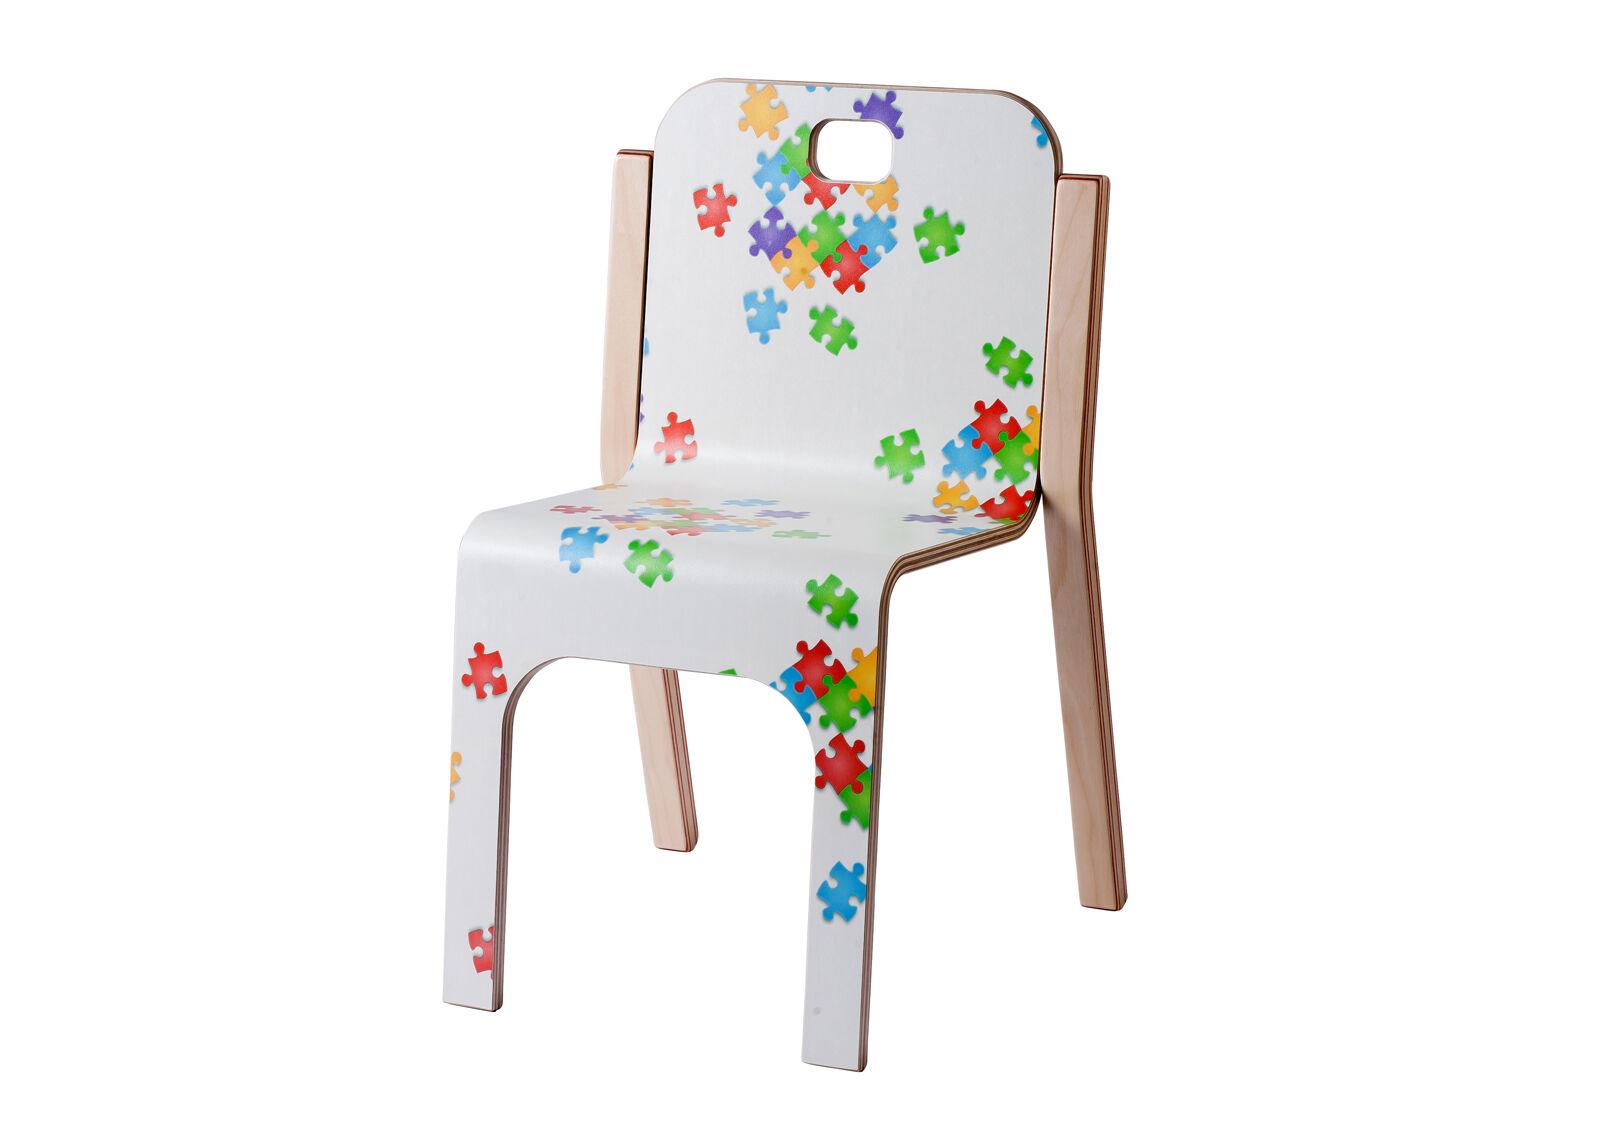 TARMEKO KIDS Lasten tuoli TOMMY 3 PUZZLE h 57/35 cm